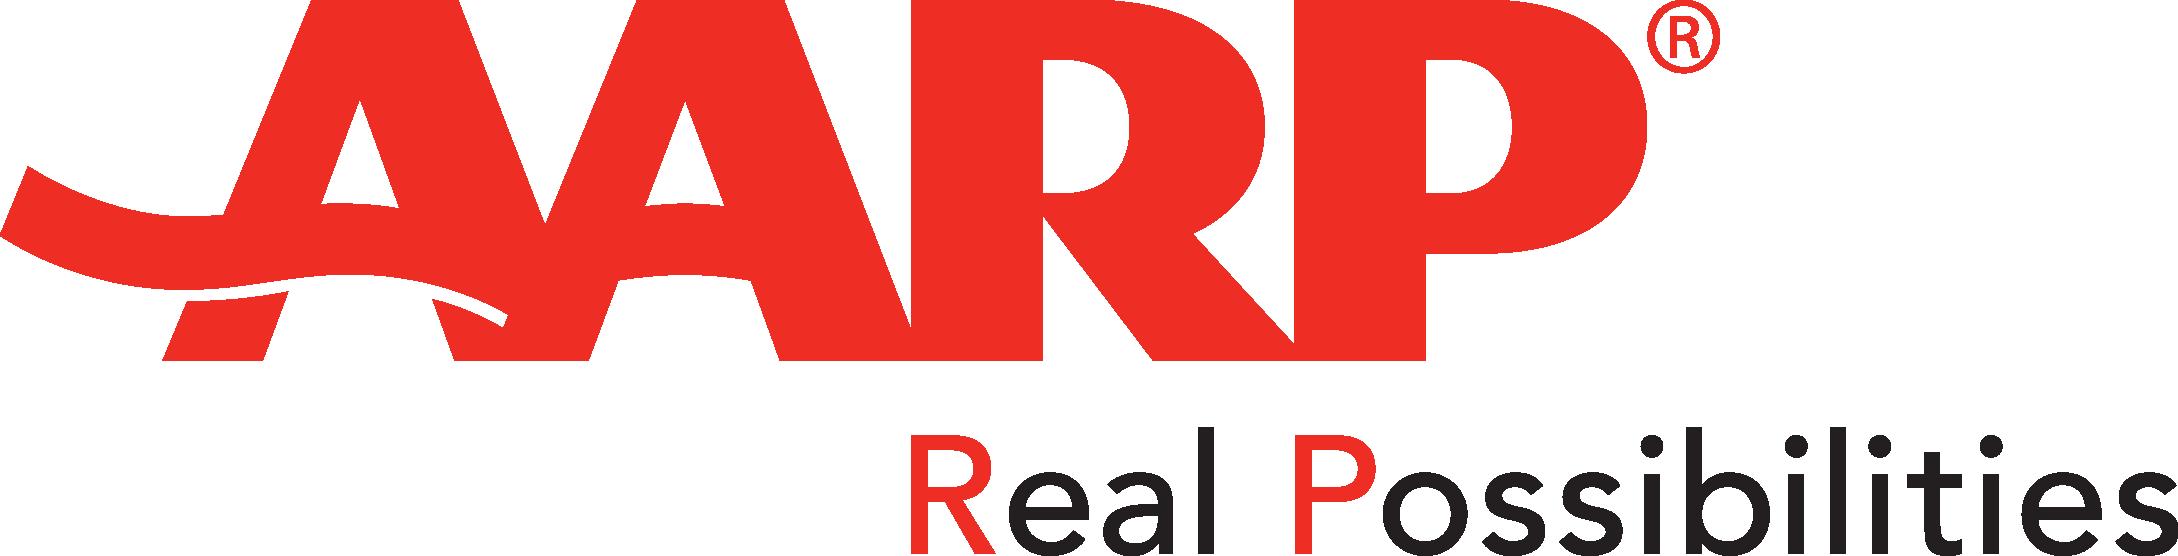 logo_AARP Real Possibilities-LockUp (2).png